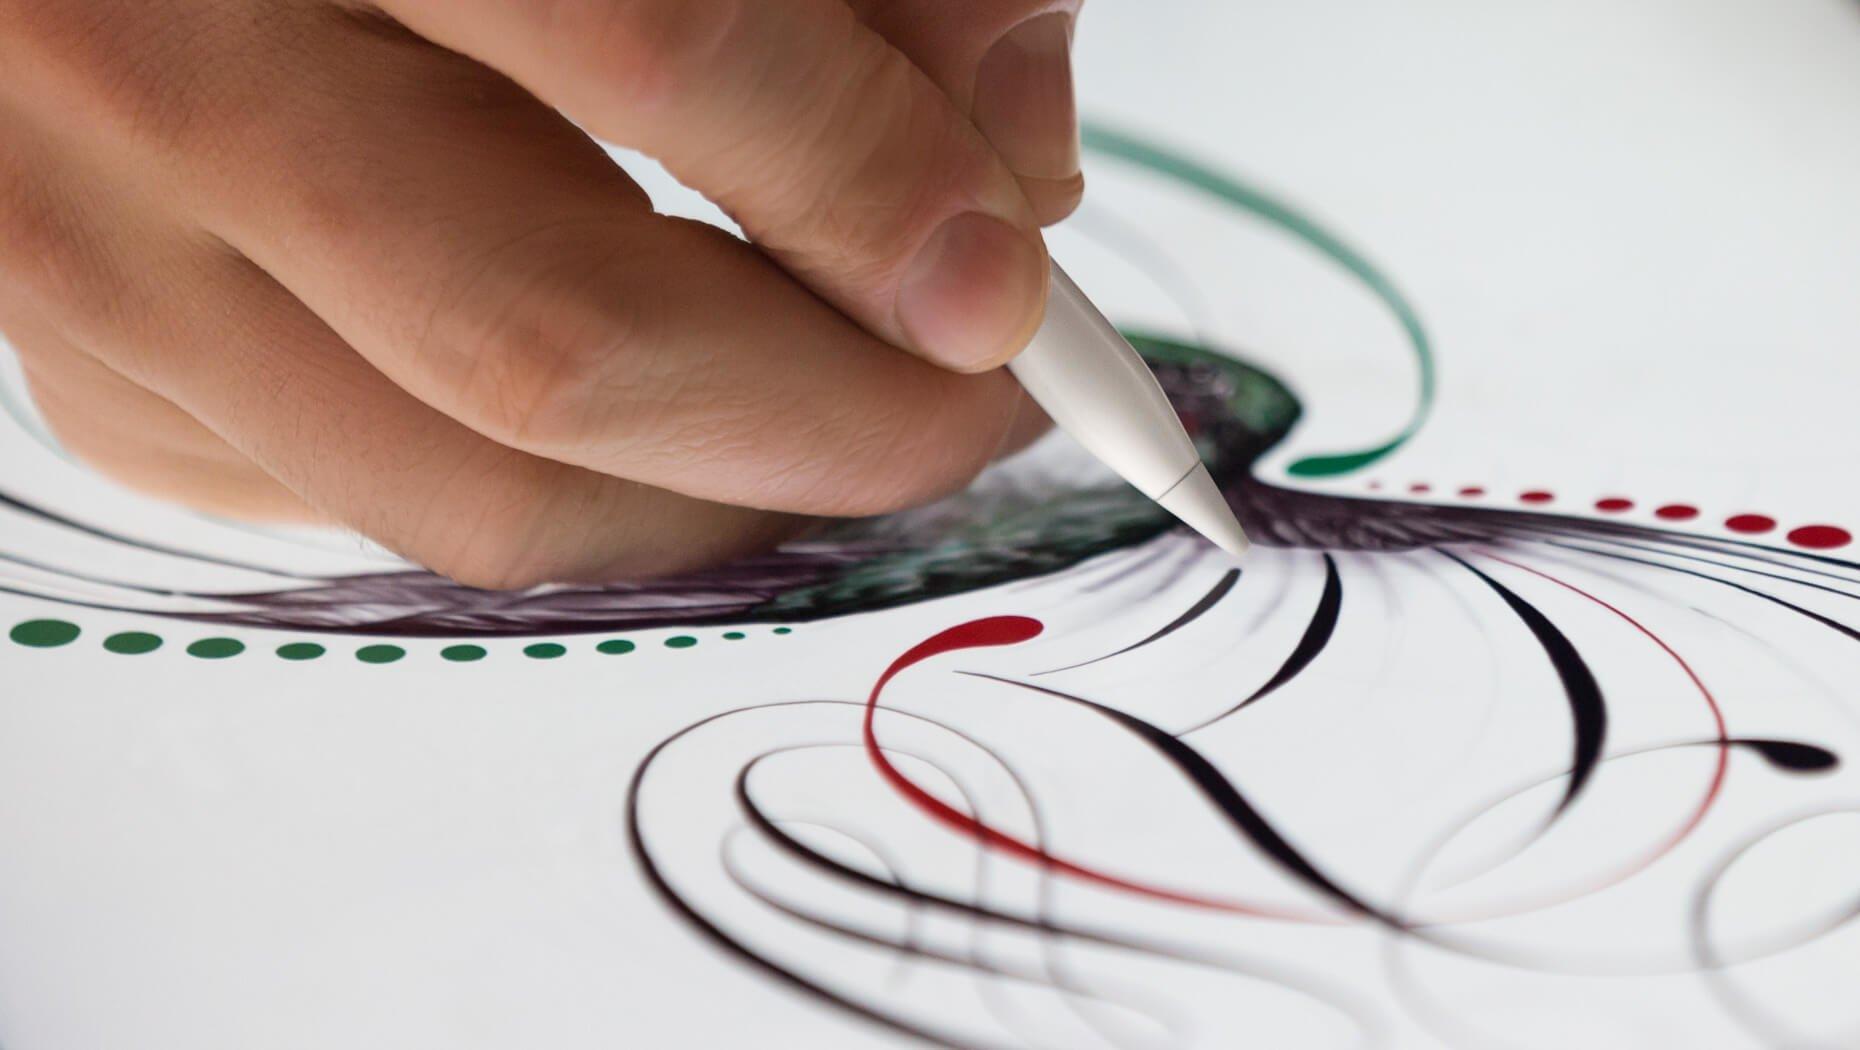 Apple Pencil Apple Pencil iPad İle Apple Pencil iPad İle Eşleşmiyorsa apple pencil